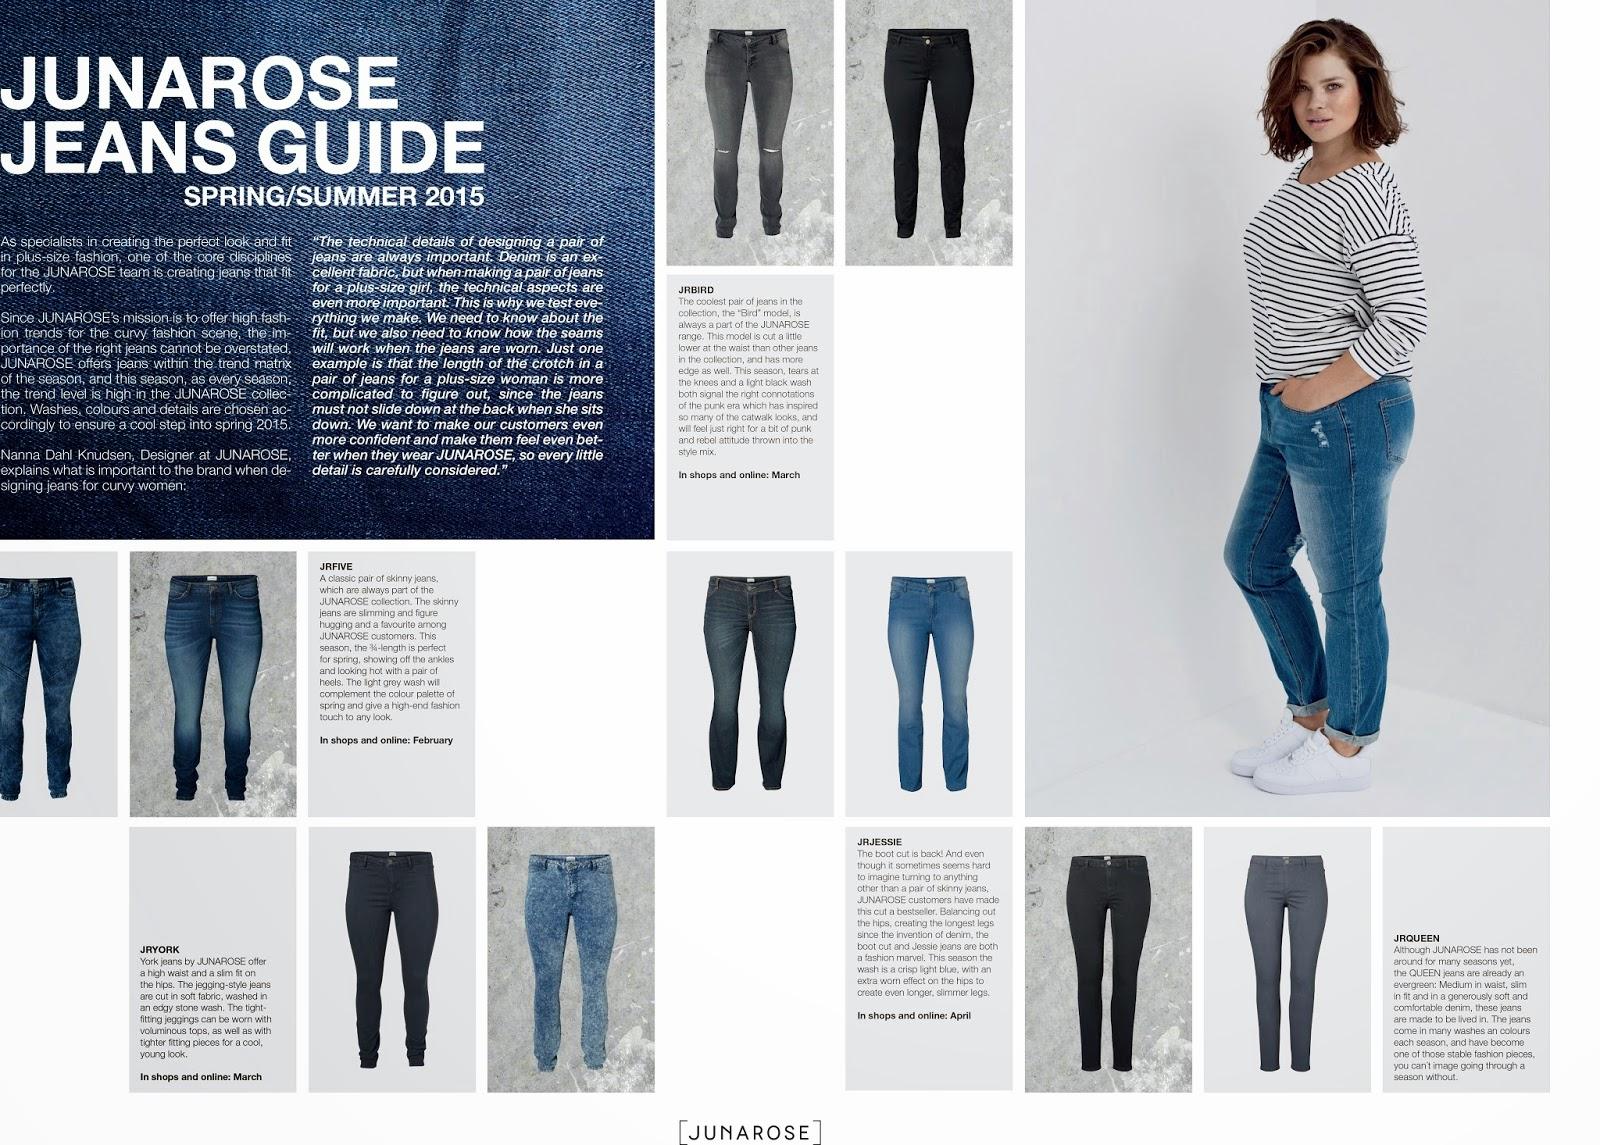 JUNAROSE jeans guide   Supersize my Fashion b8d4f5f94c